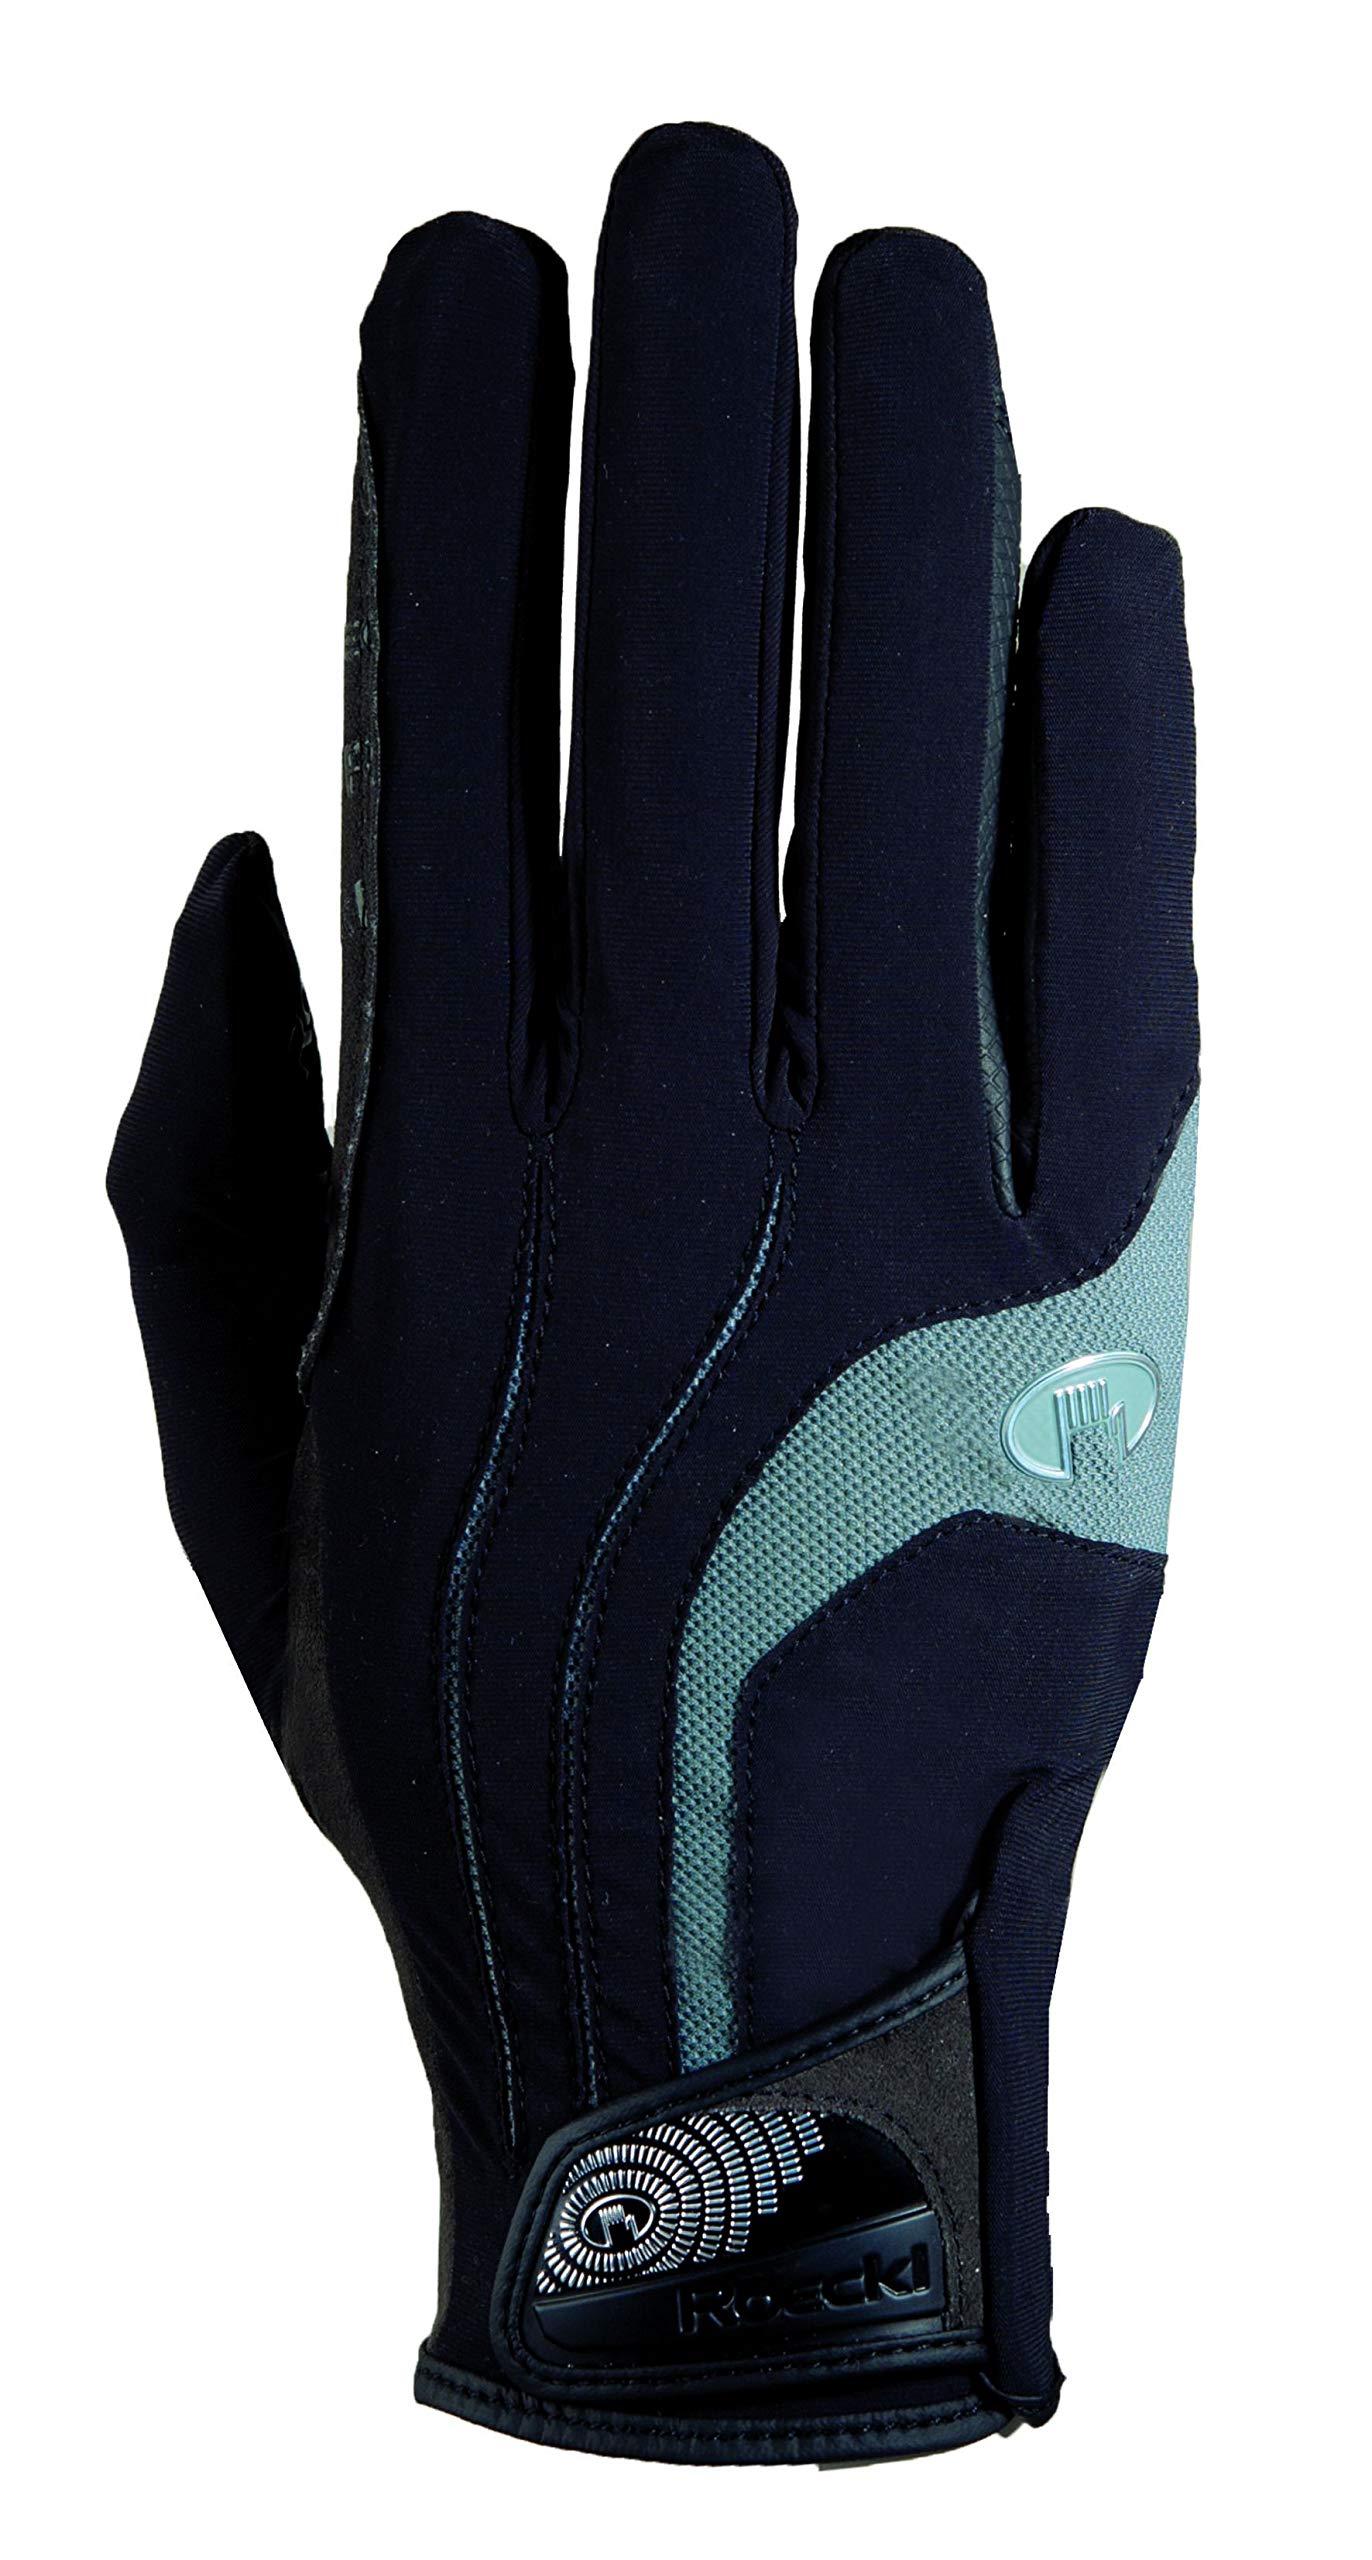 Roeckl Malia Riding Gloves Black/Grey 6.5